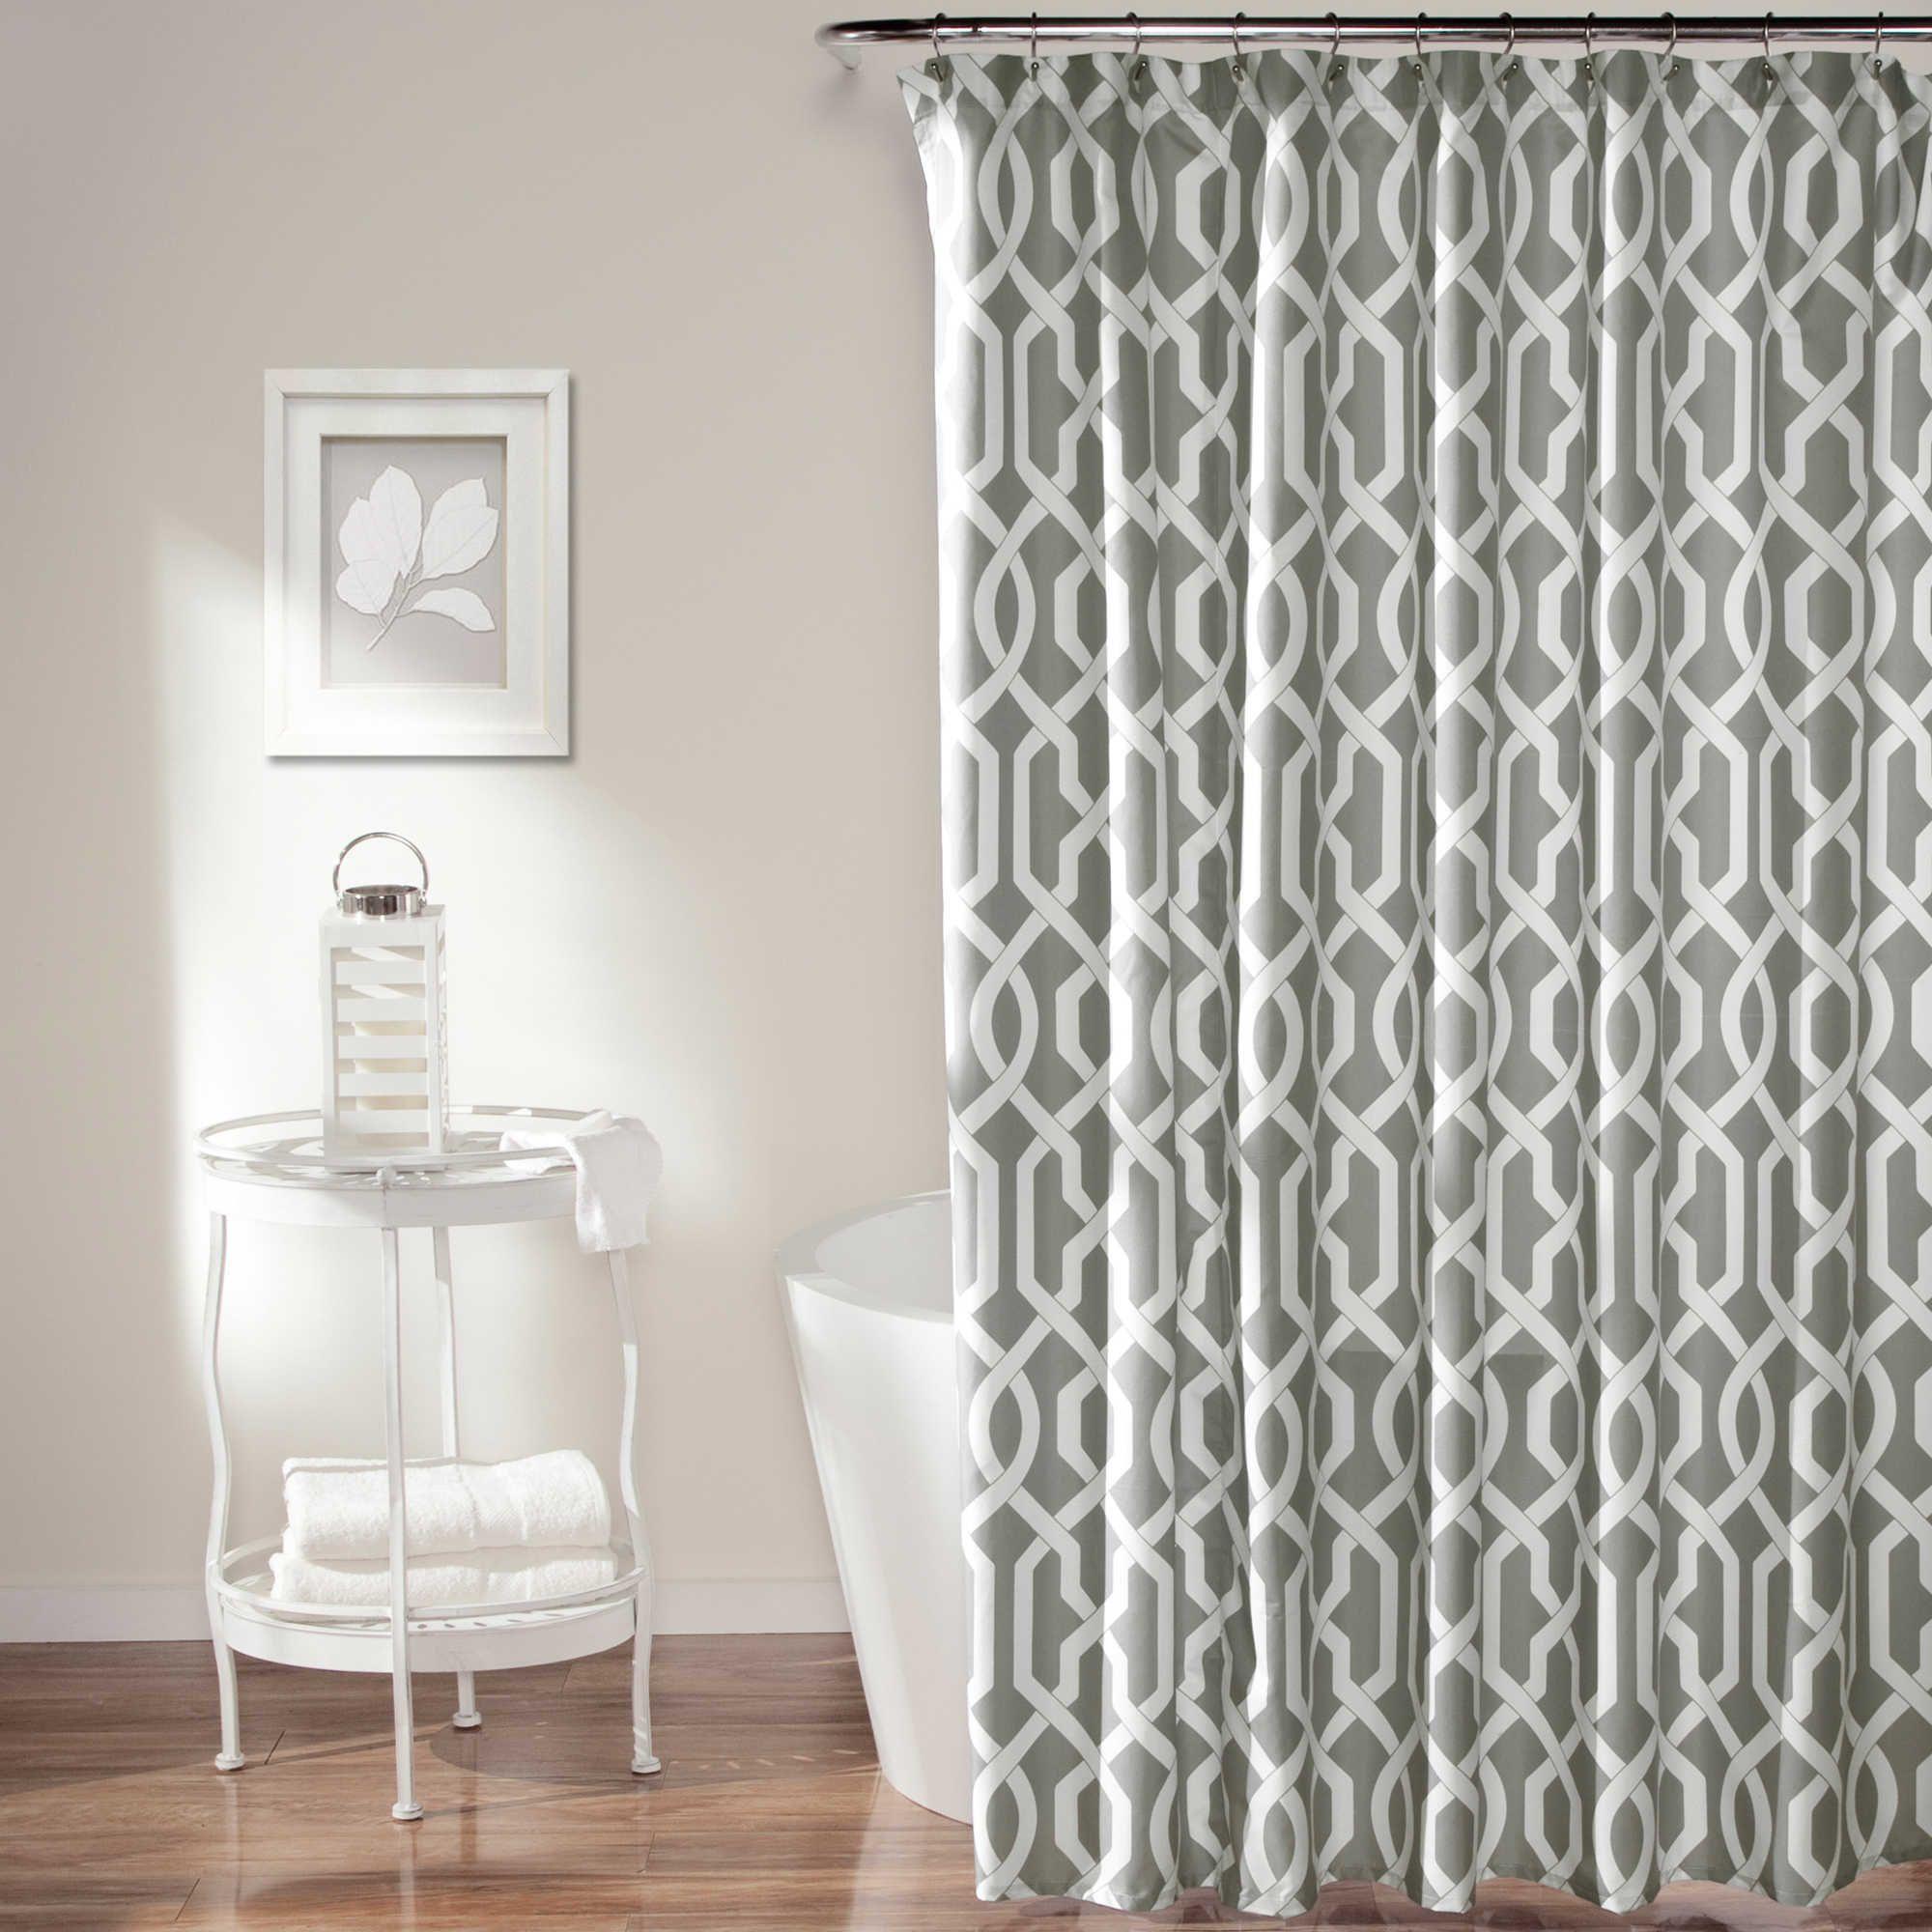 Invalid Url Lush Decor Curtains Floral Shower Curtains